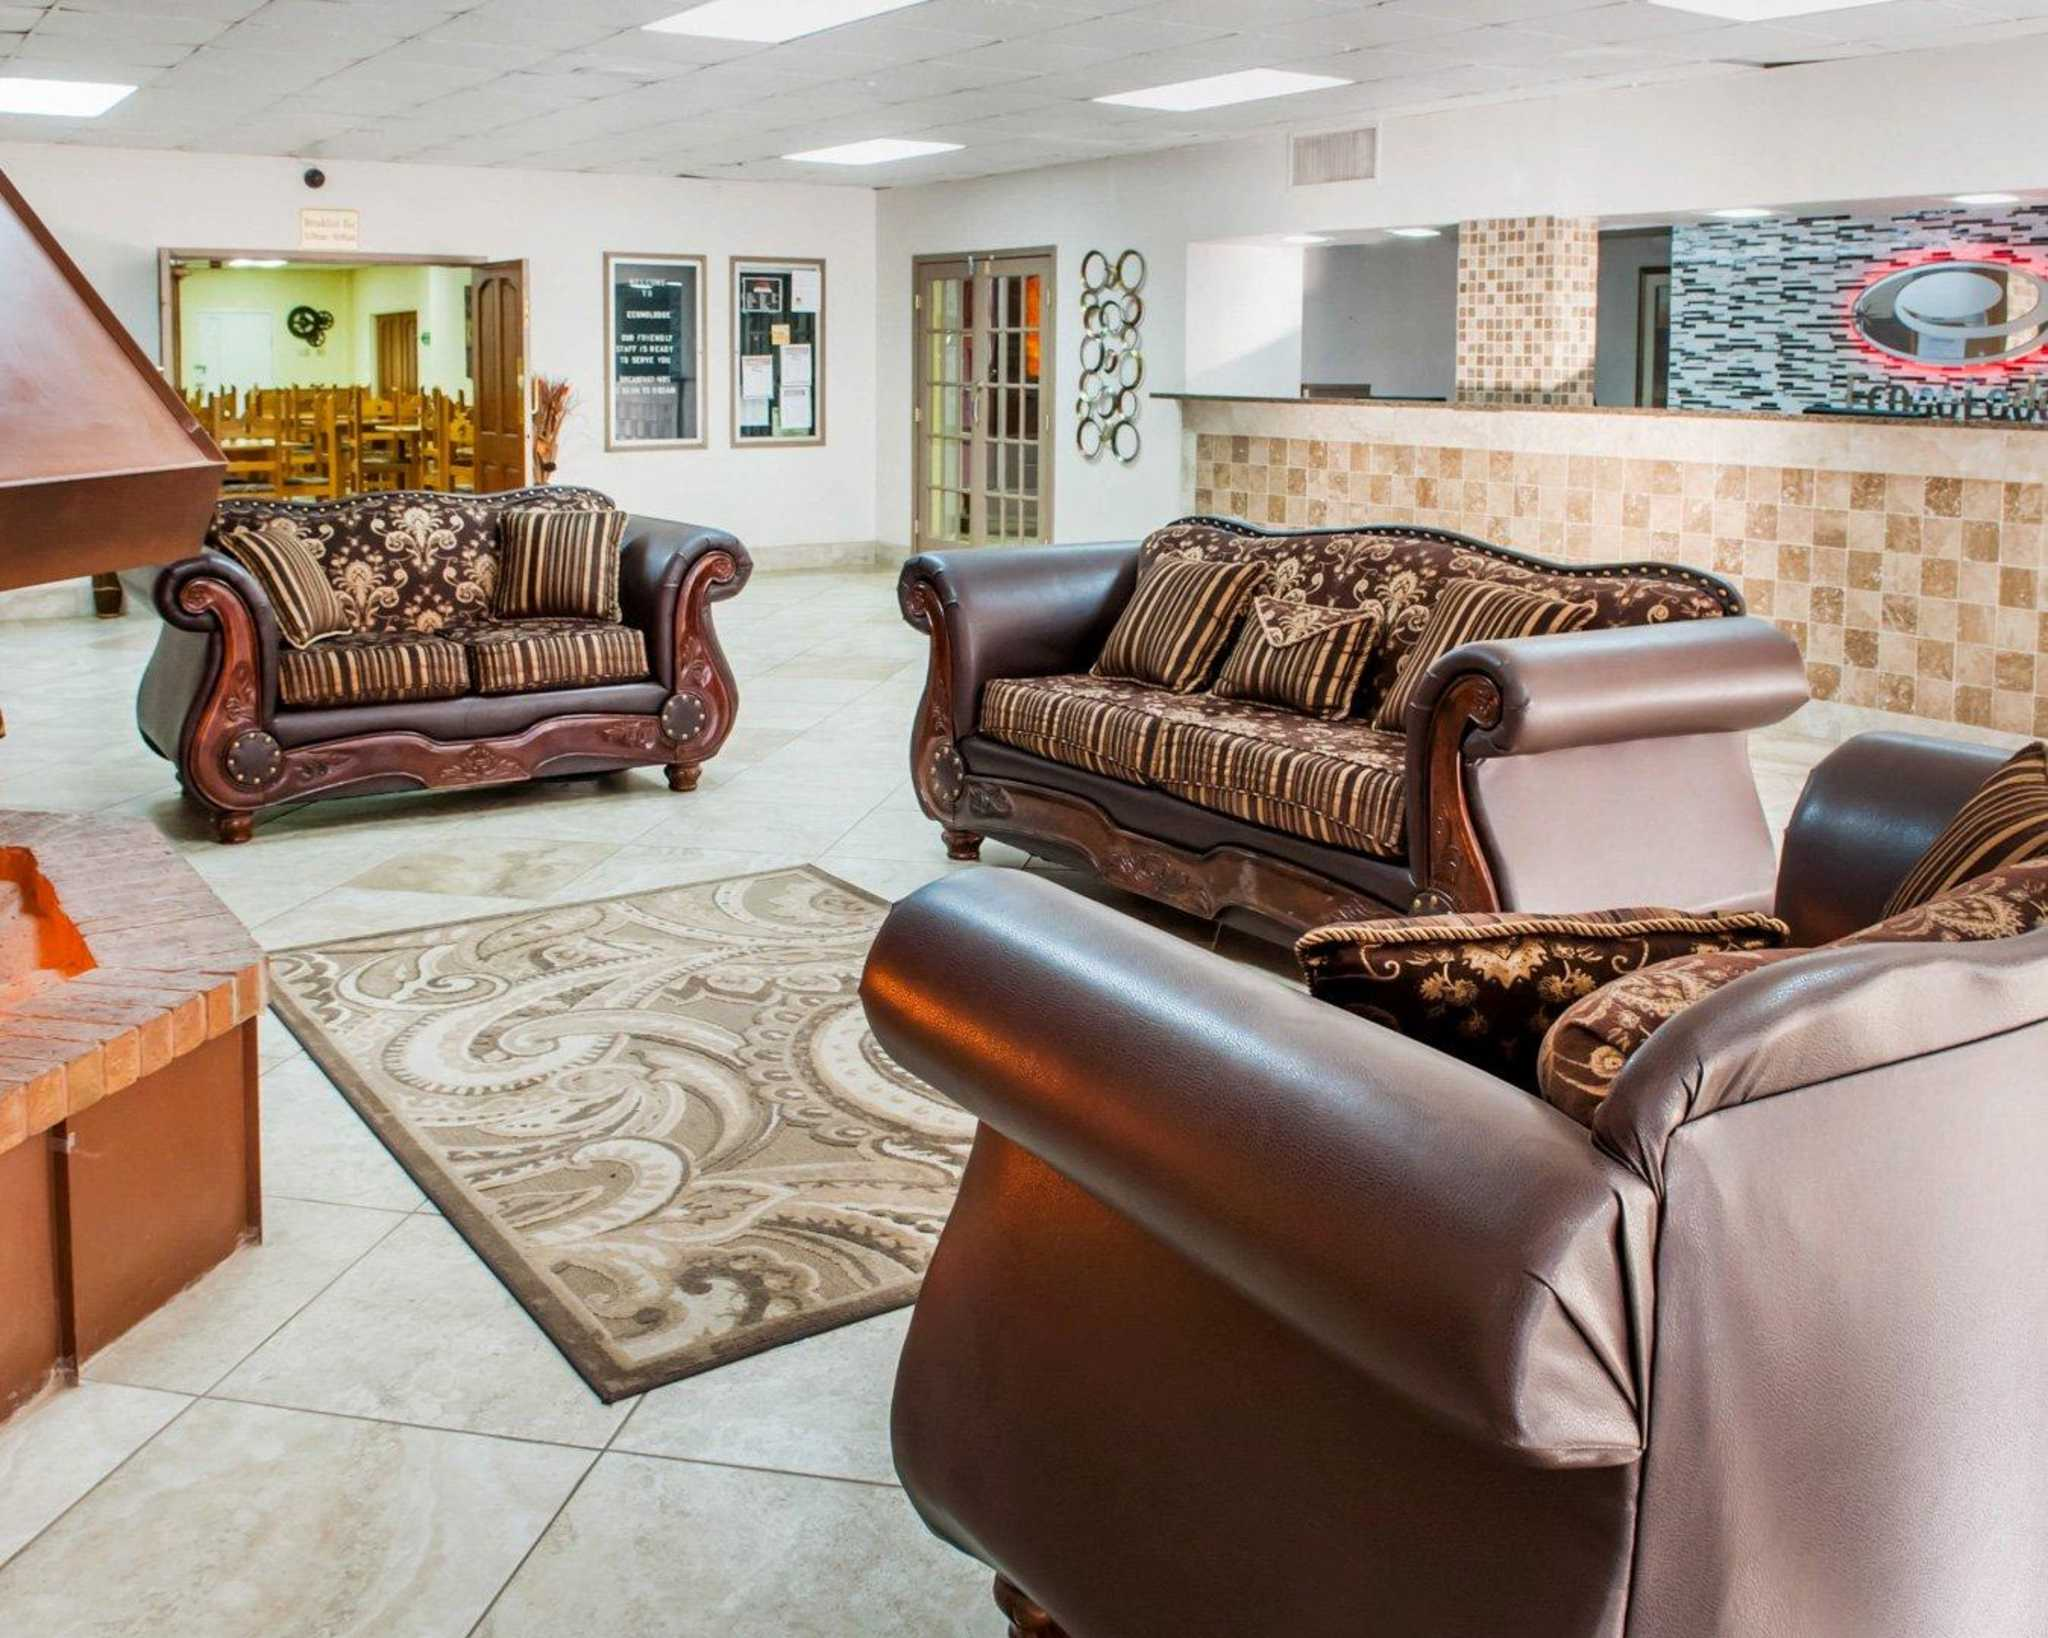 Econo Lodge image 18